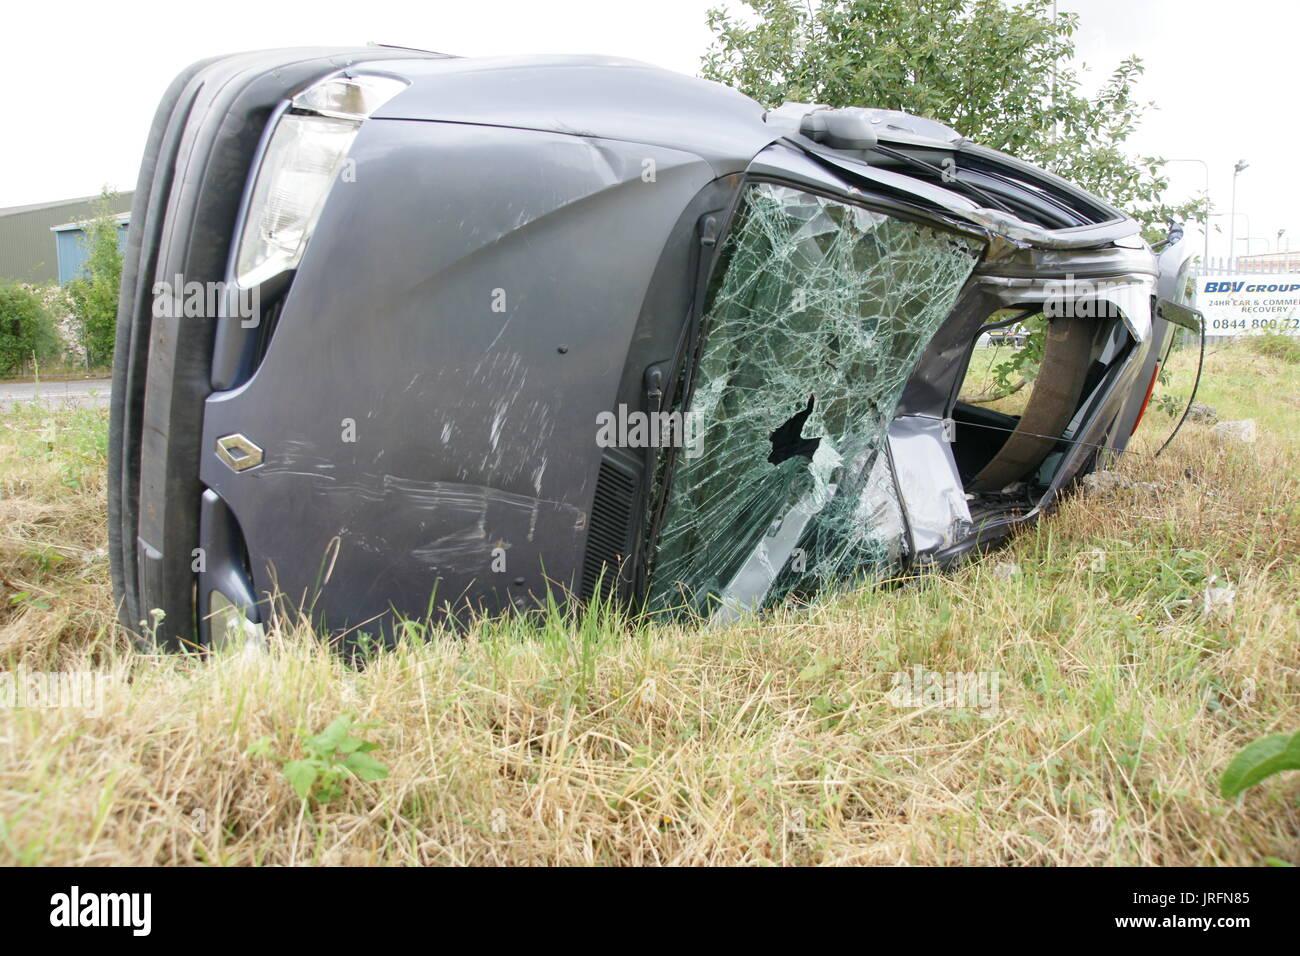 Crash Accident Rta Incident Stock Photos & Crash Accident Rta